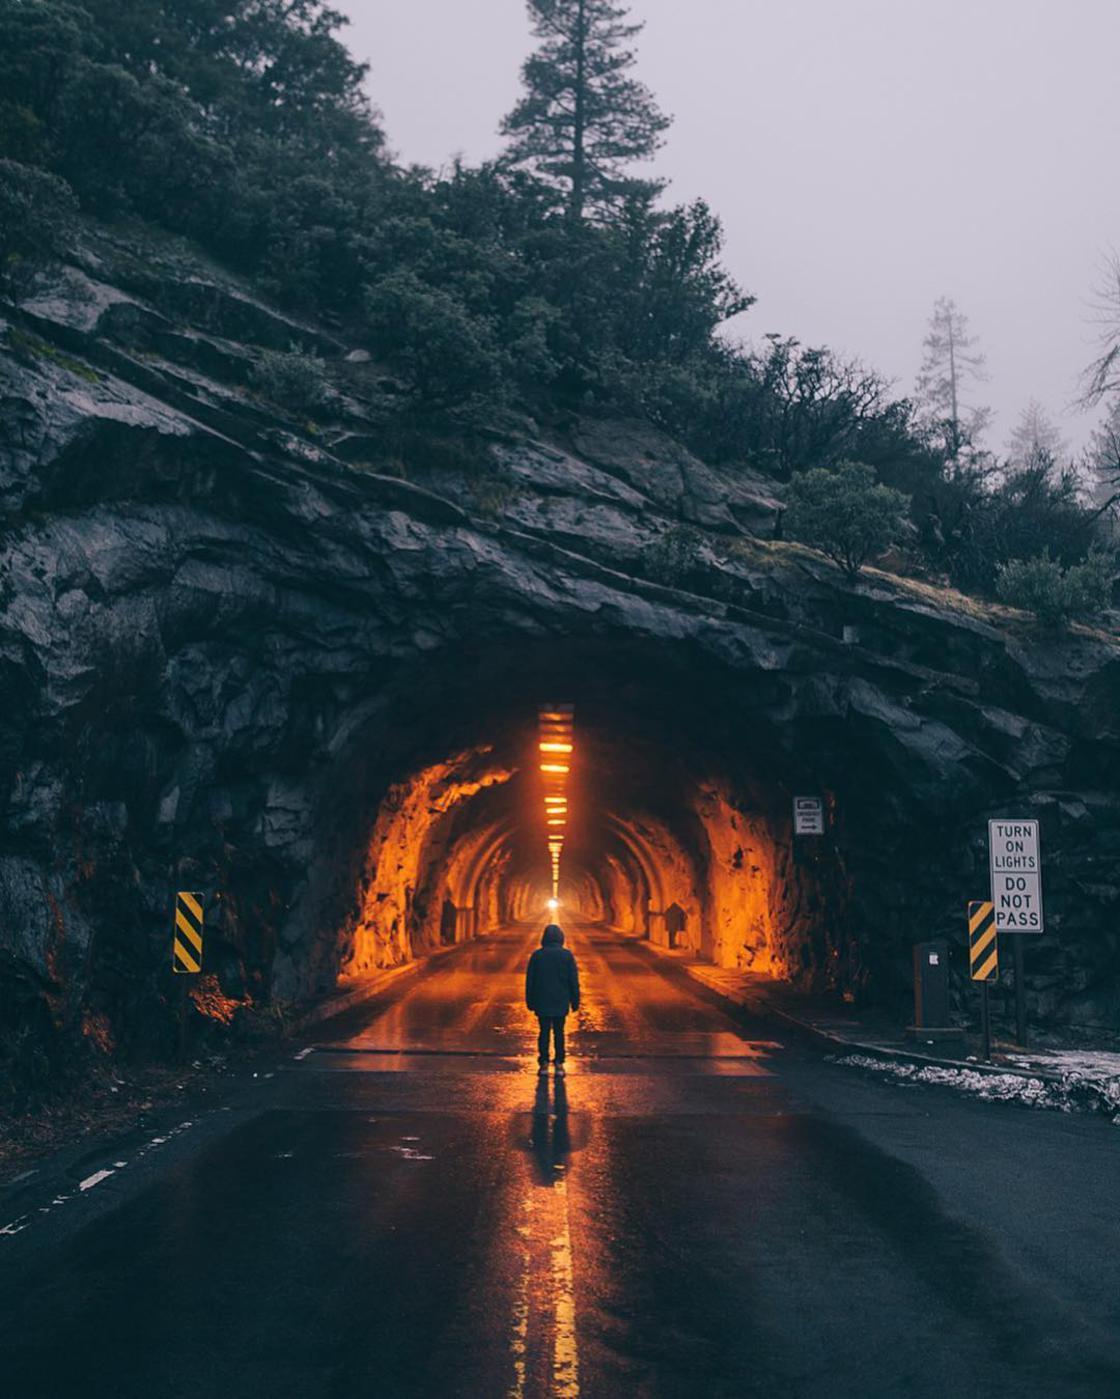 Deepsky – The fascinating urban photographs by Tatsuto Shibata